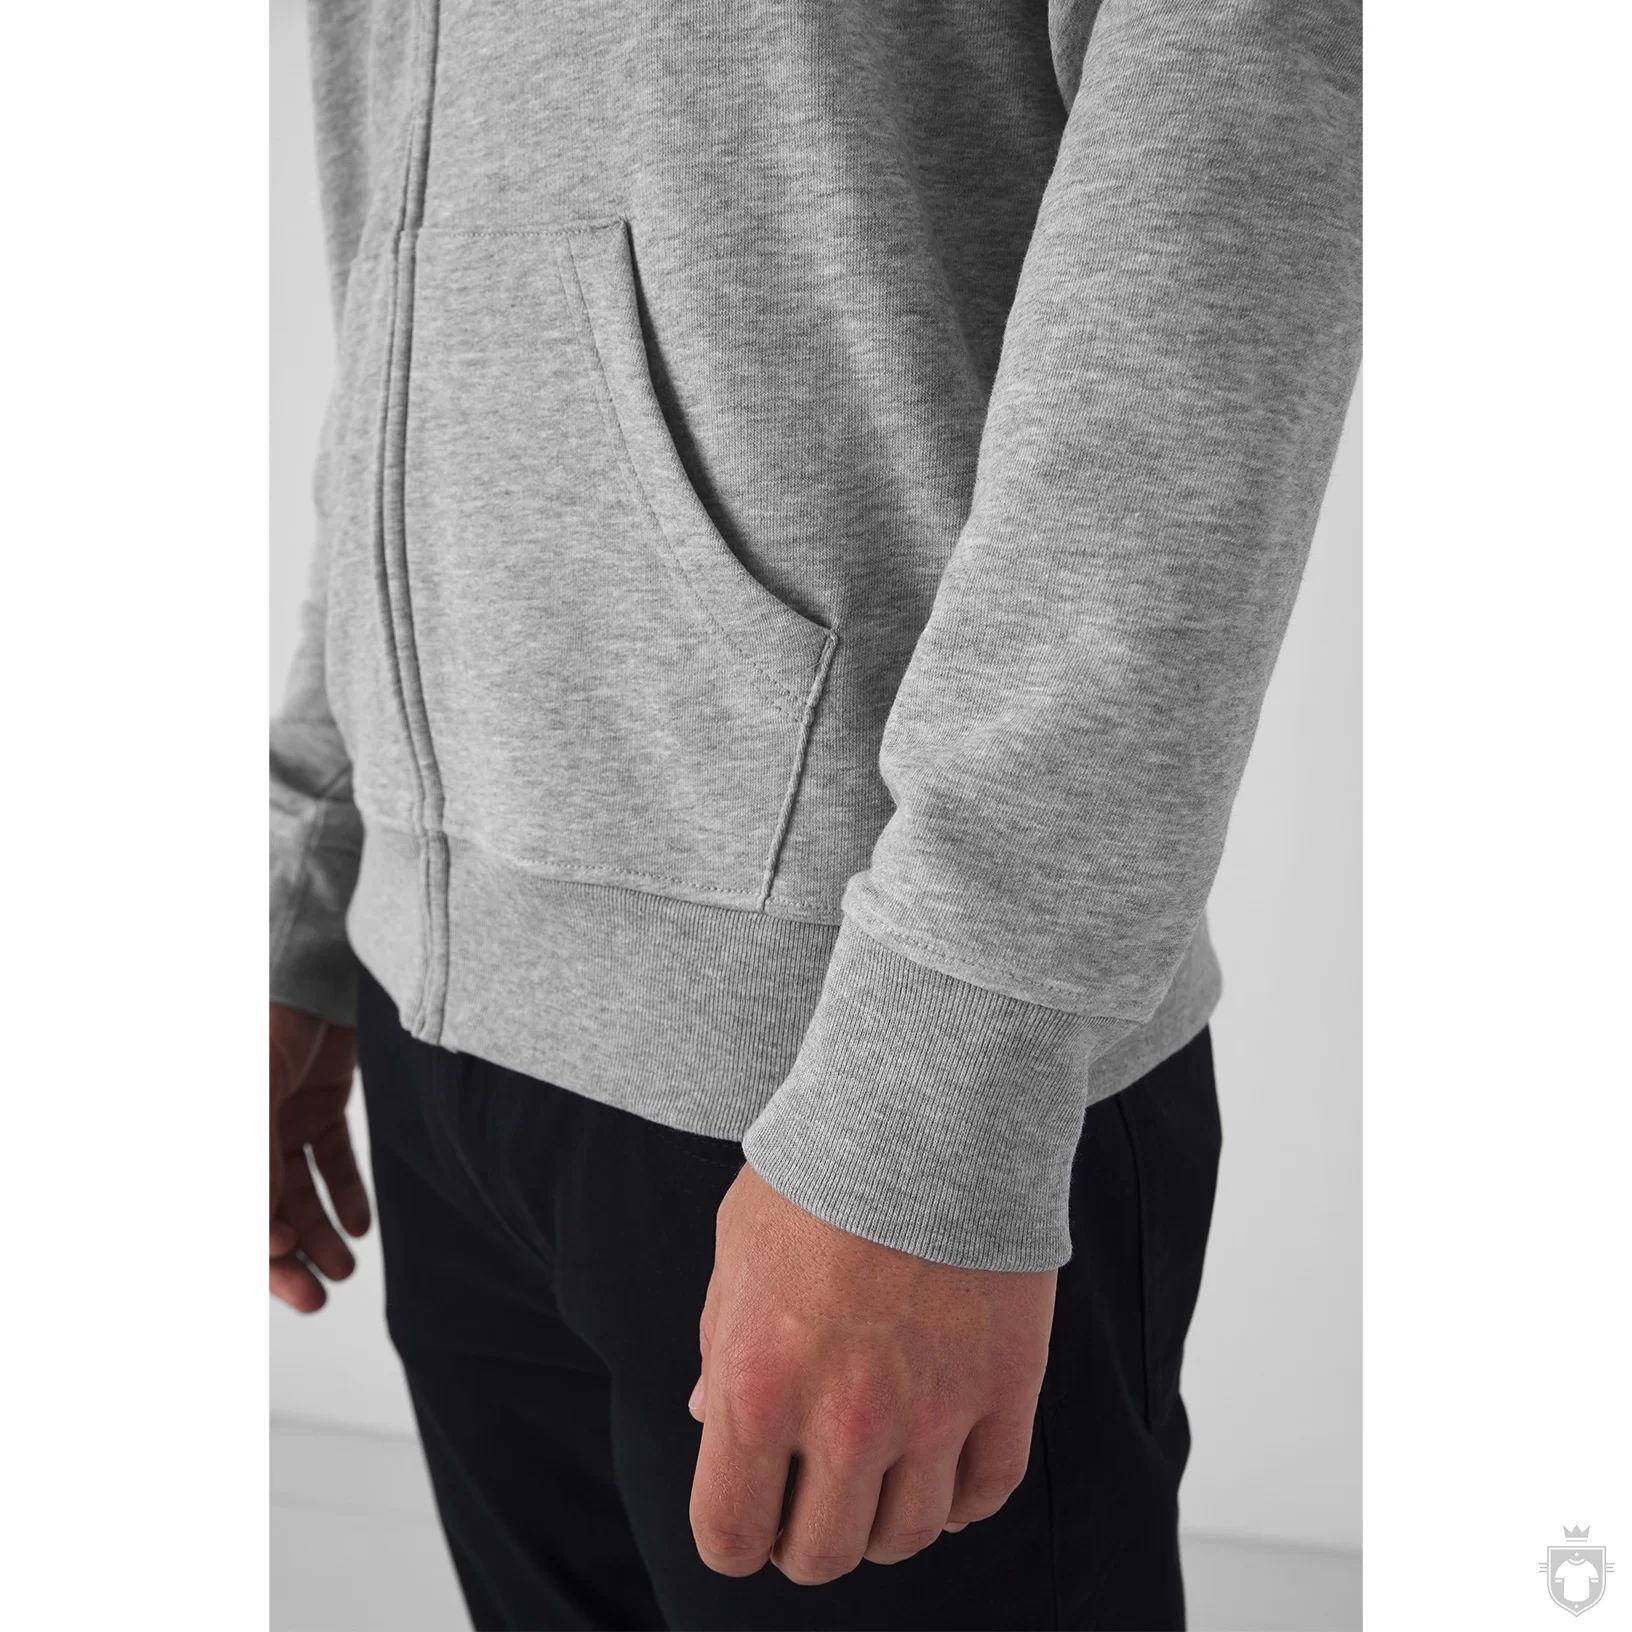 B&C Organic Zipped Hood.